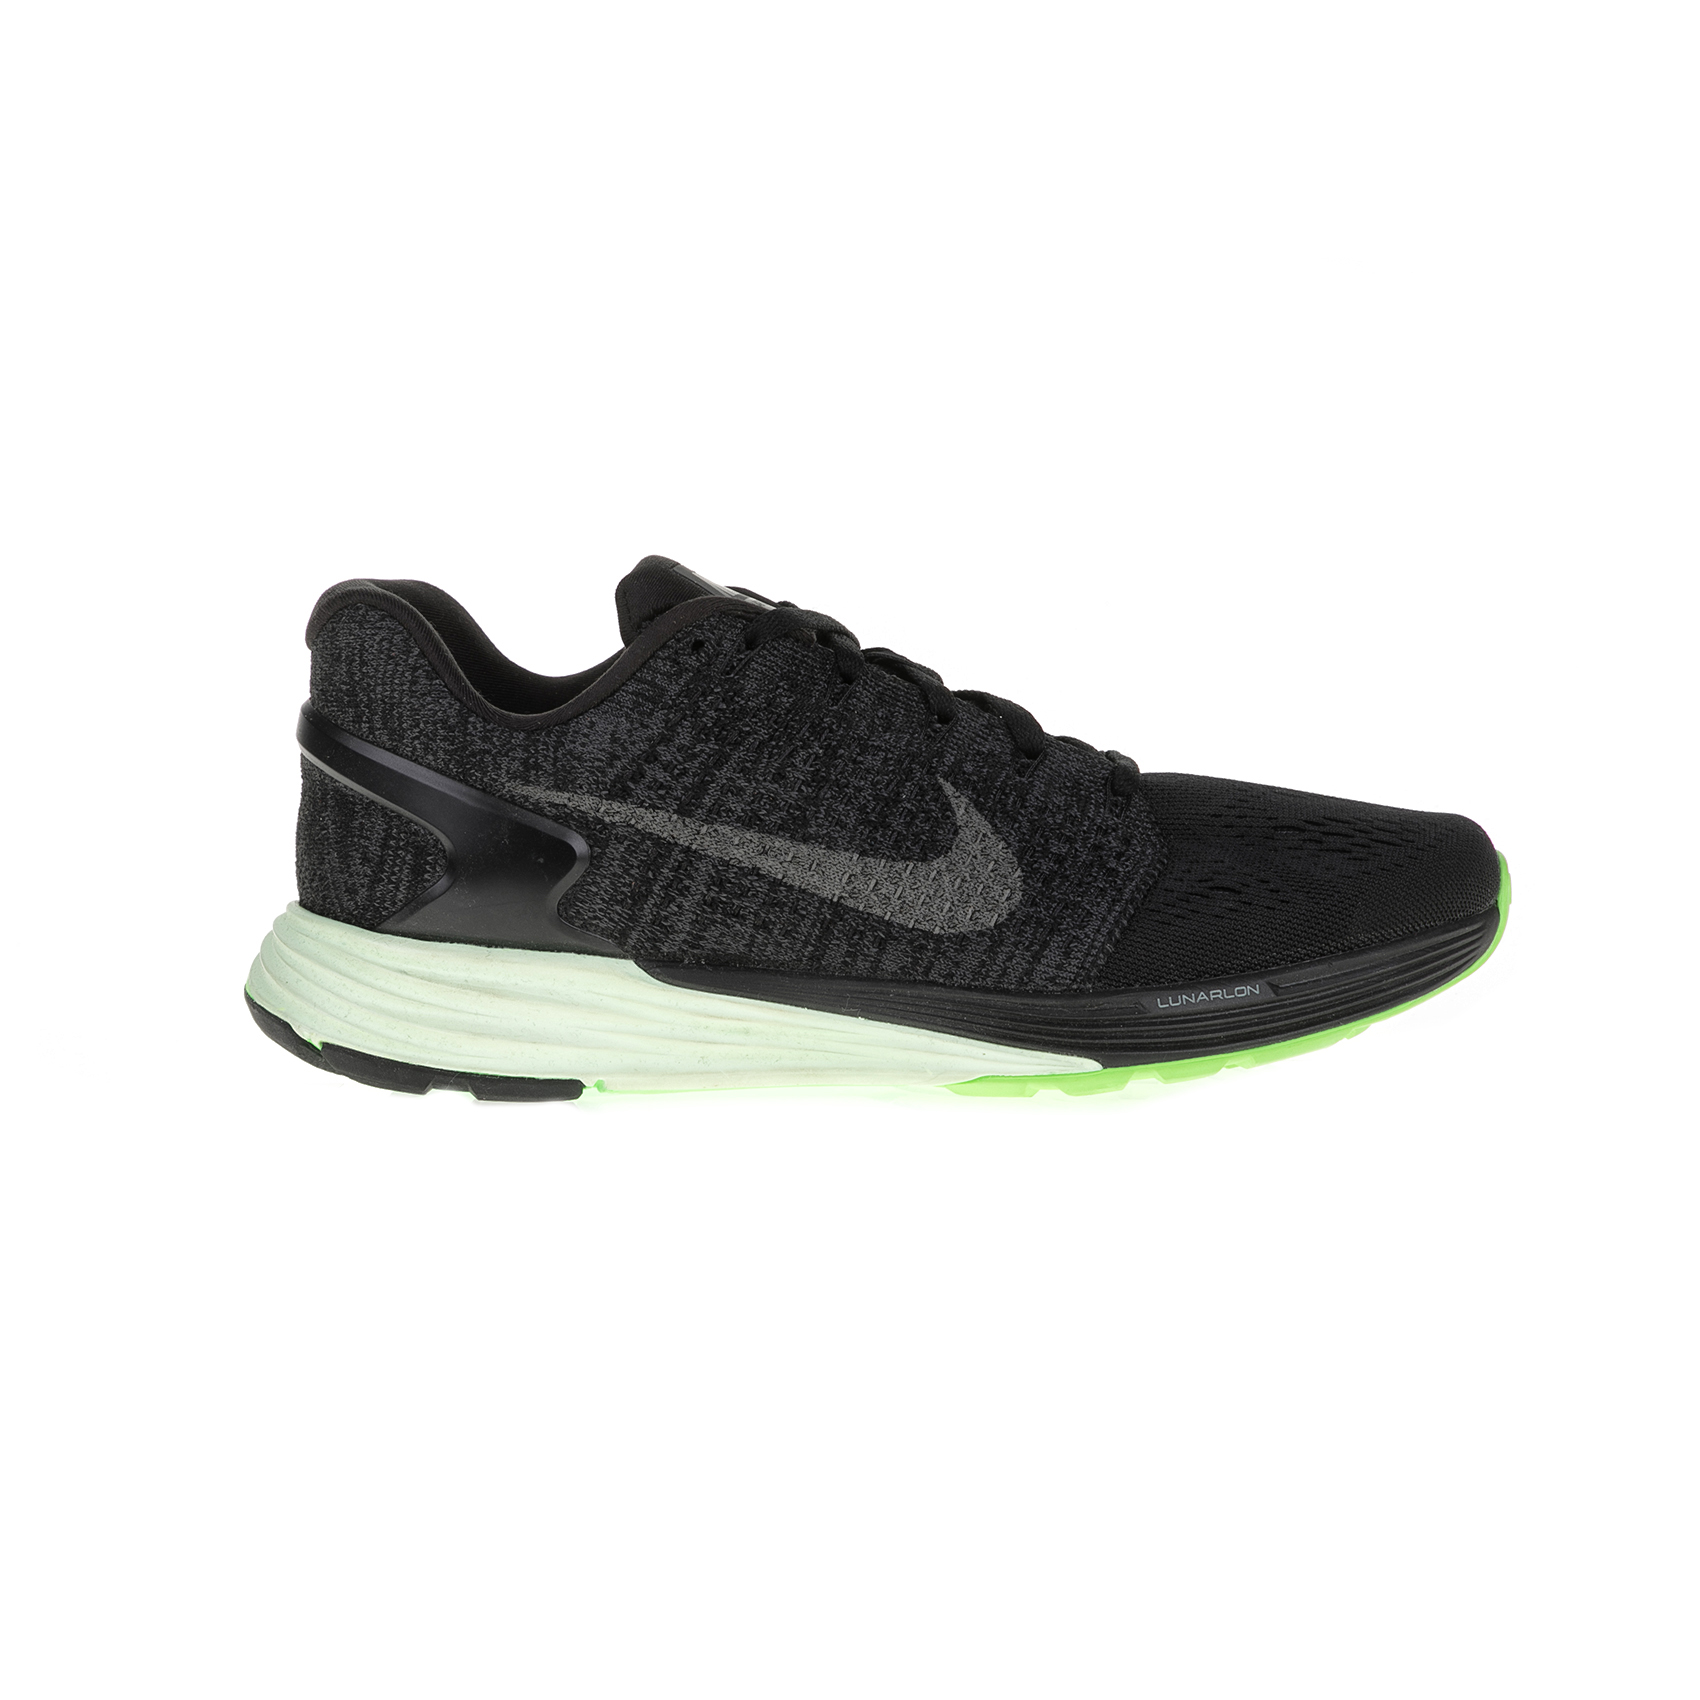 NIKE – Ανδρικά παπούτσια NIKE LUNARGLIDE 7 μαύρα